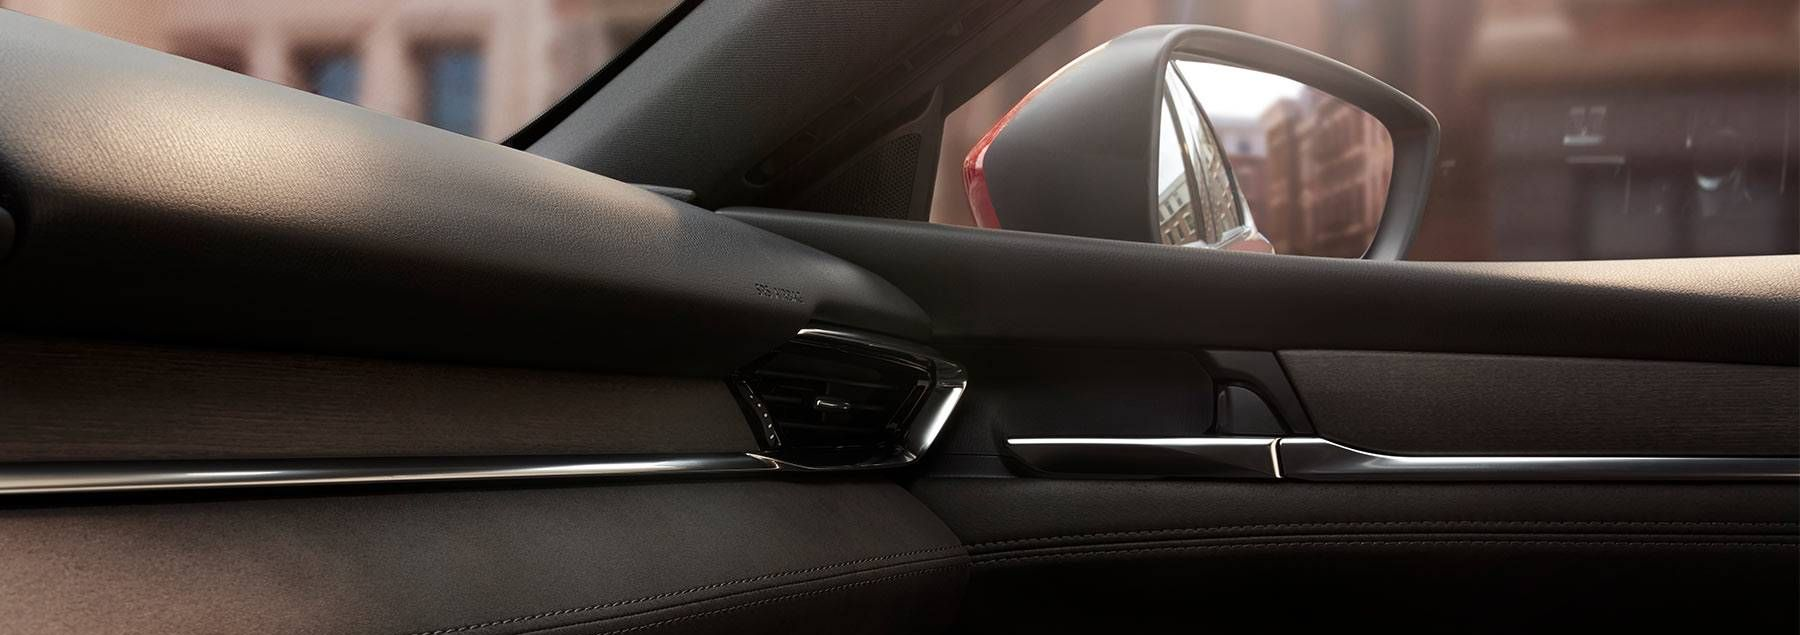 Style in the Mazda6!